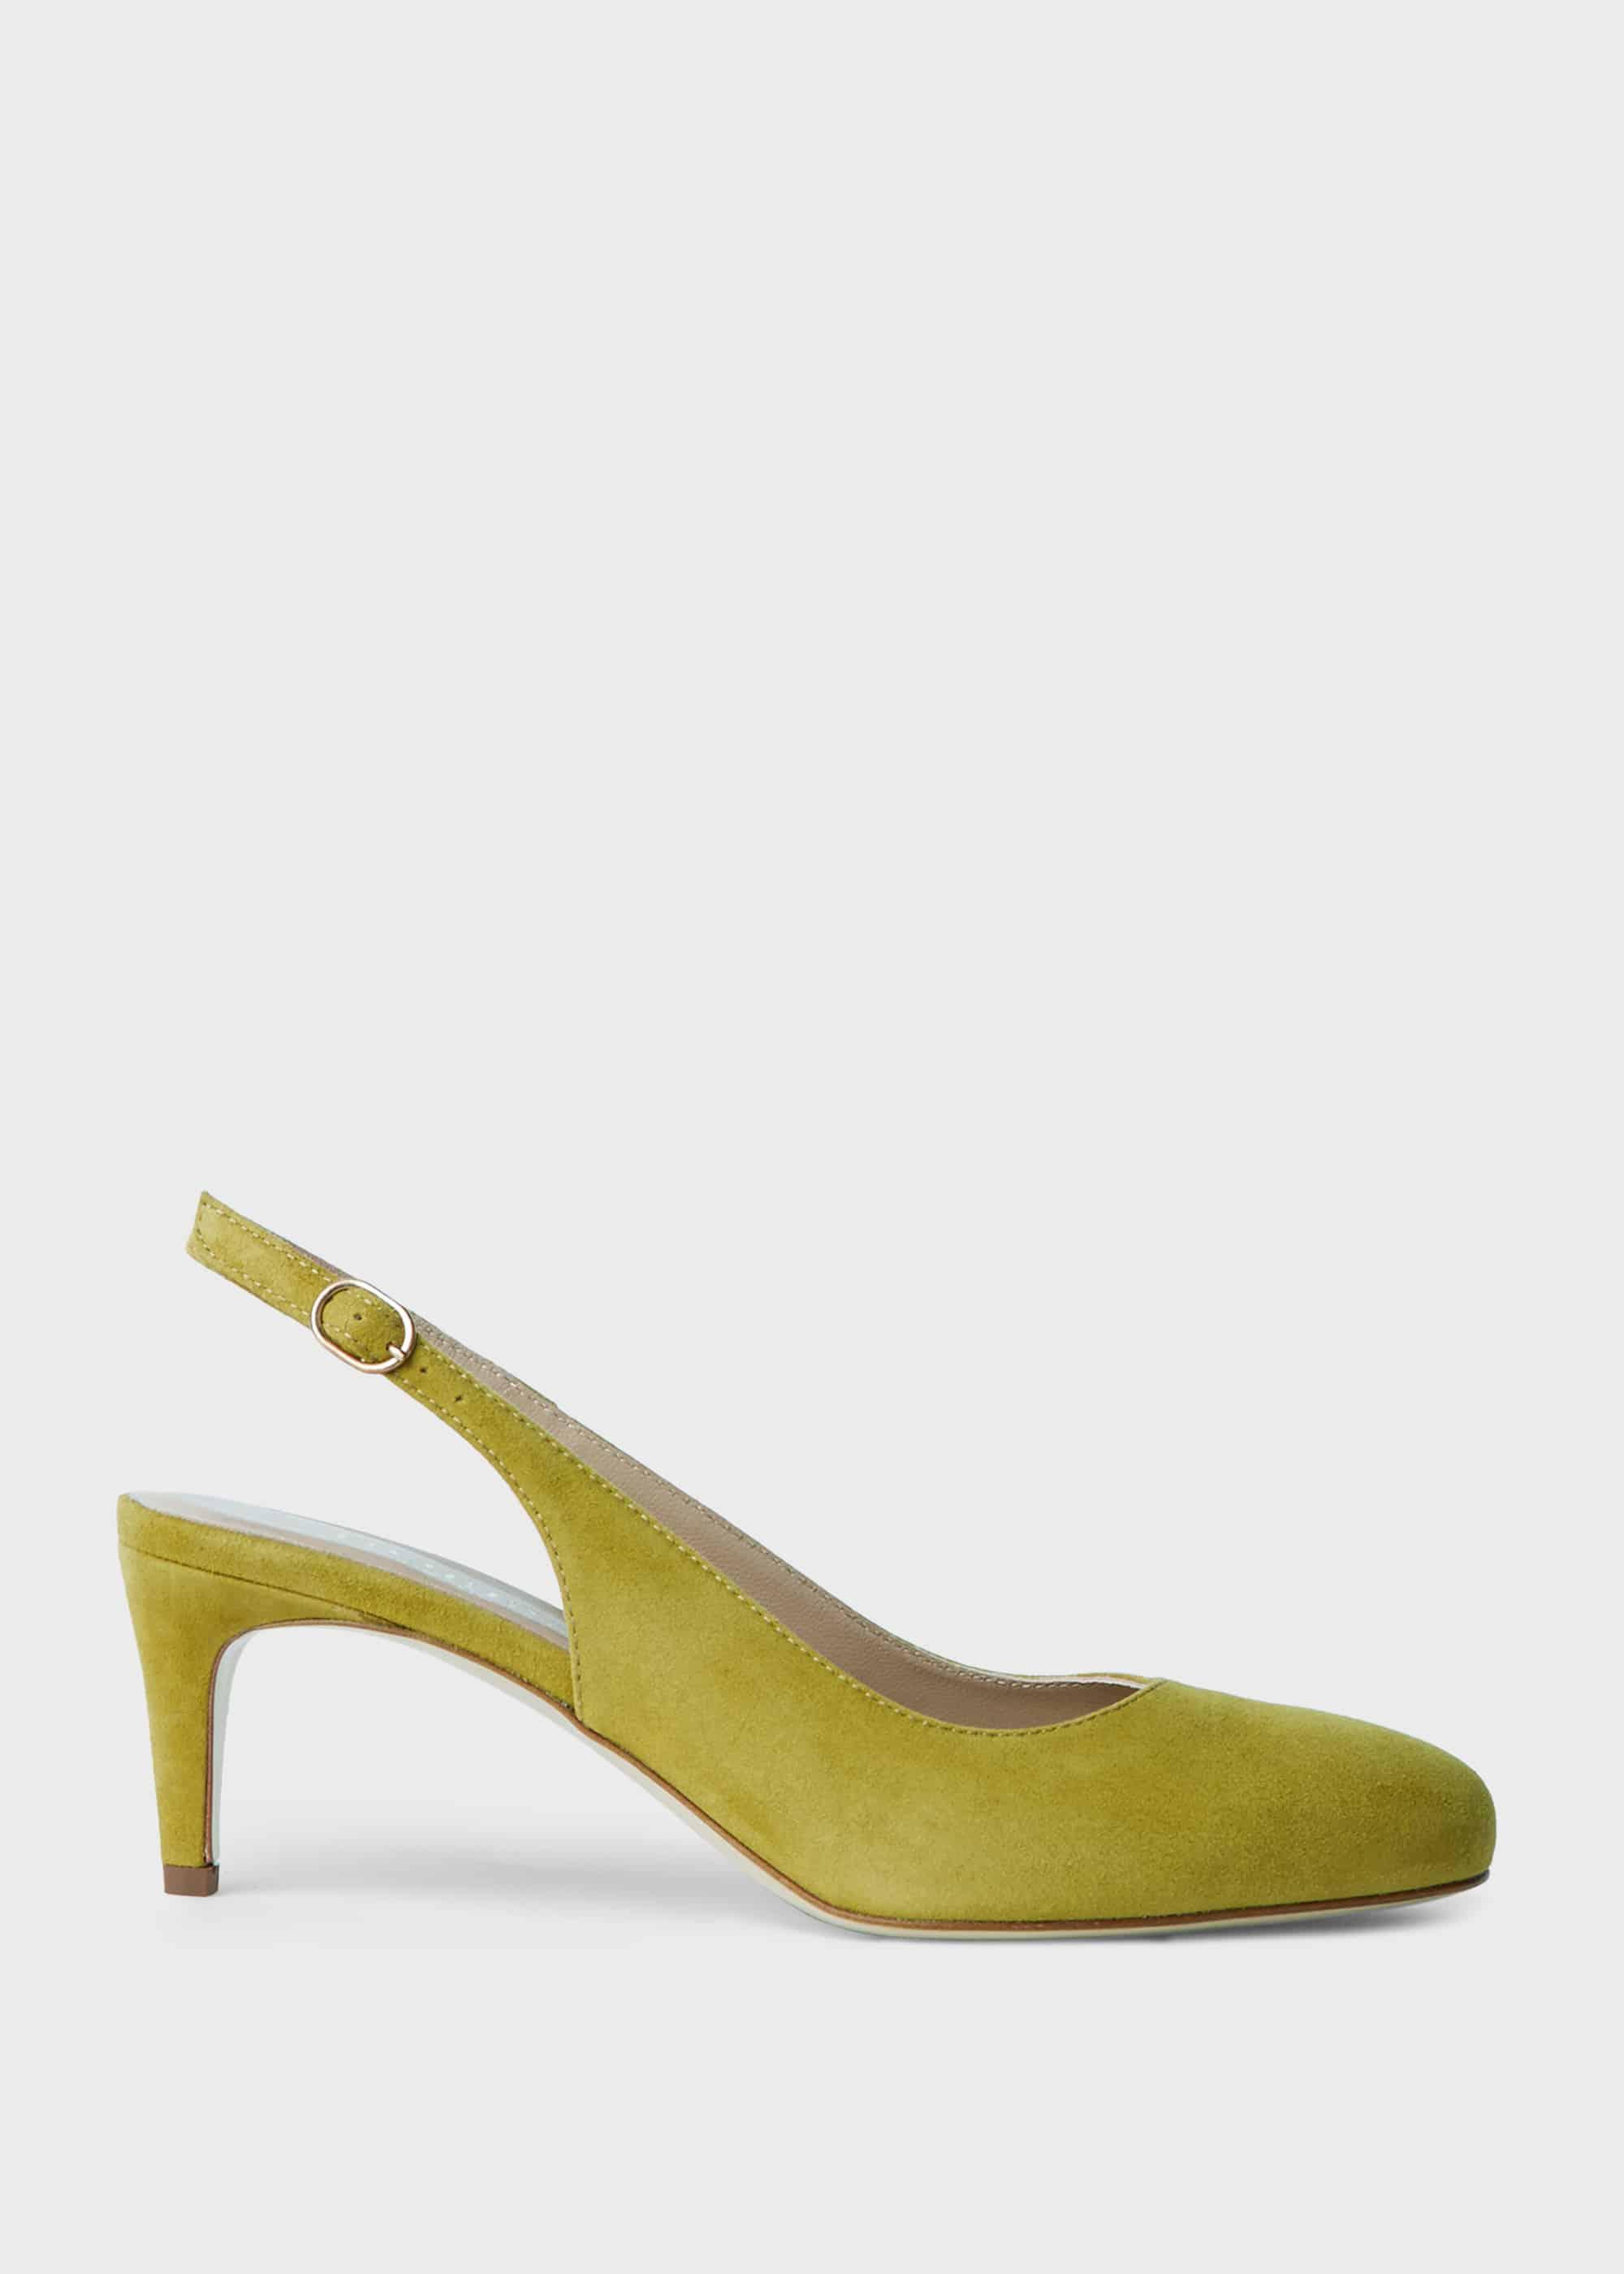 Hobbs Women Emma Suede Stiletto Slingback Court Shoes